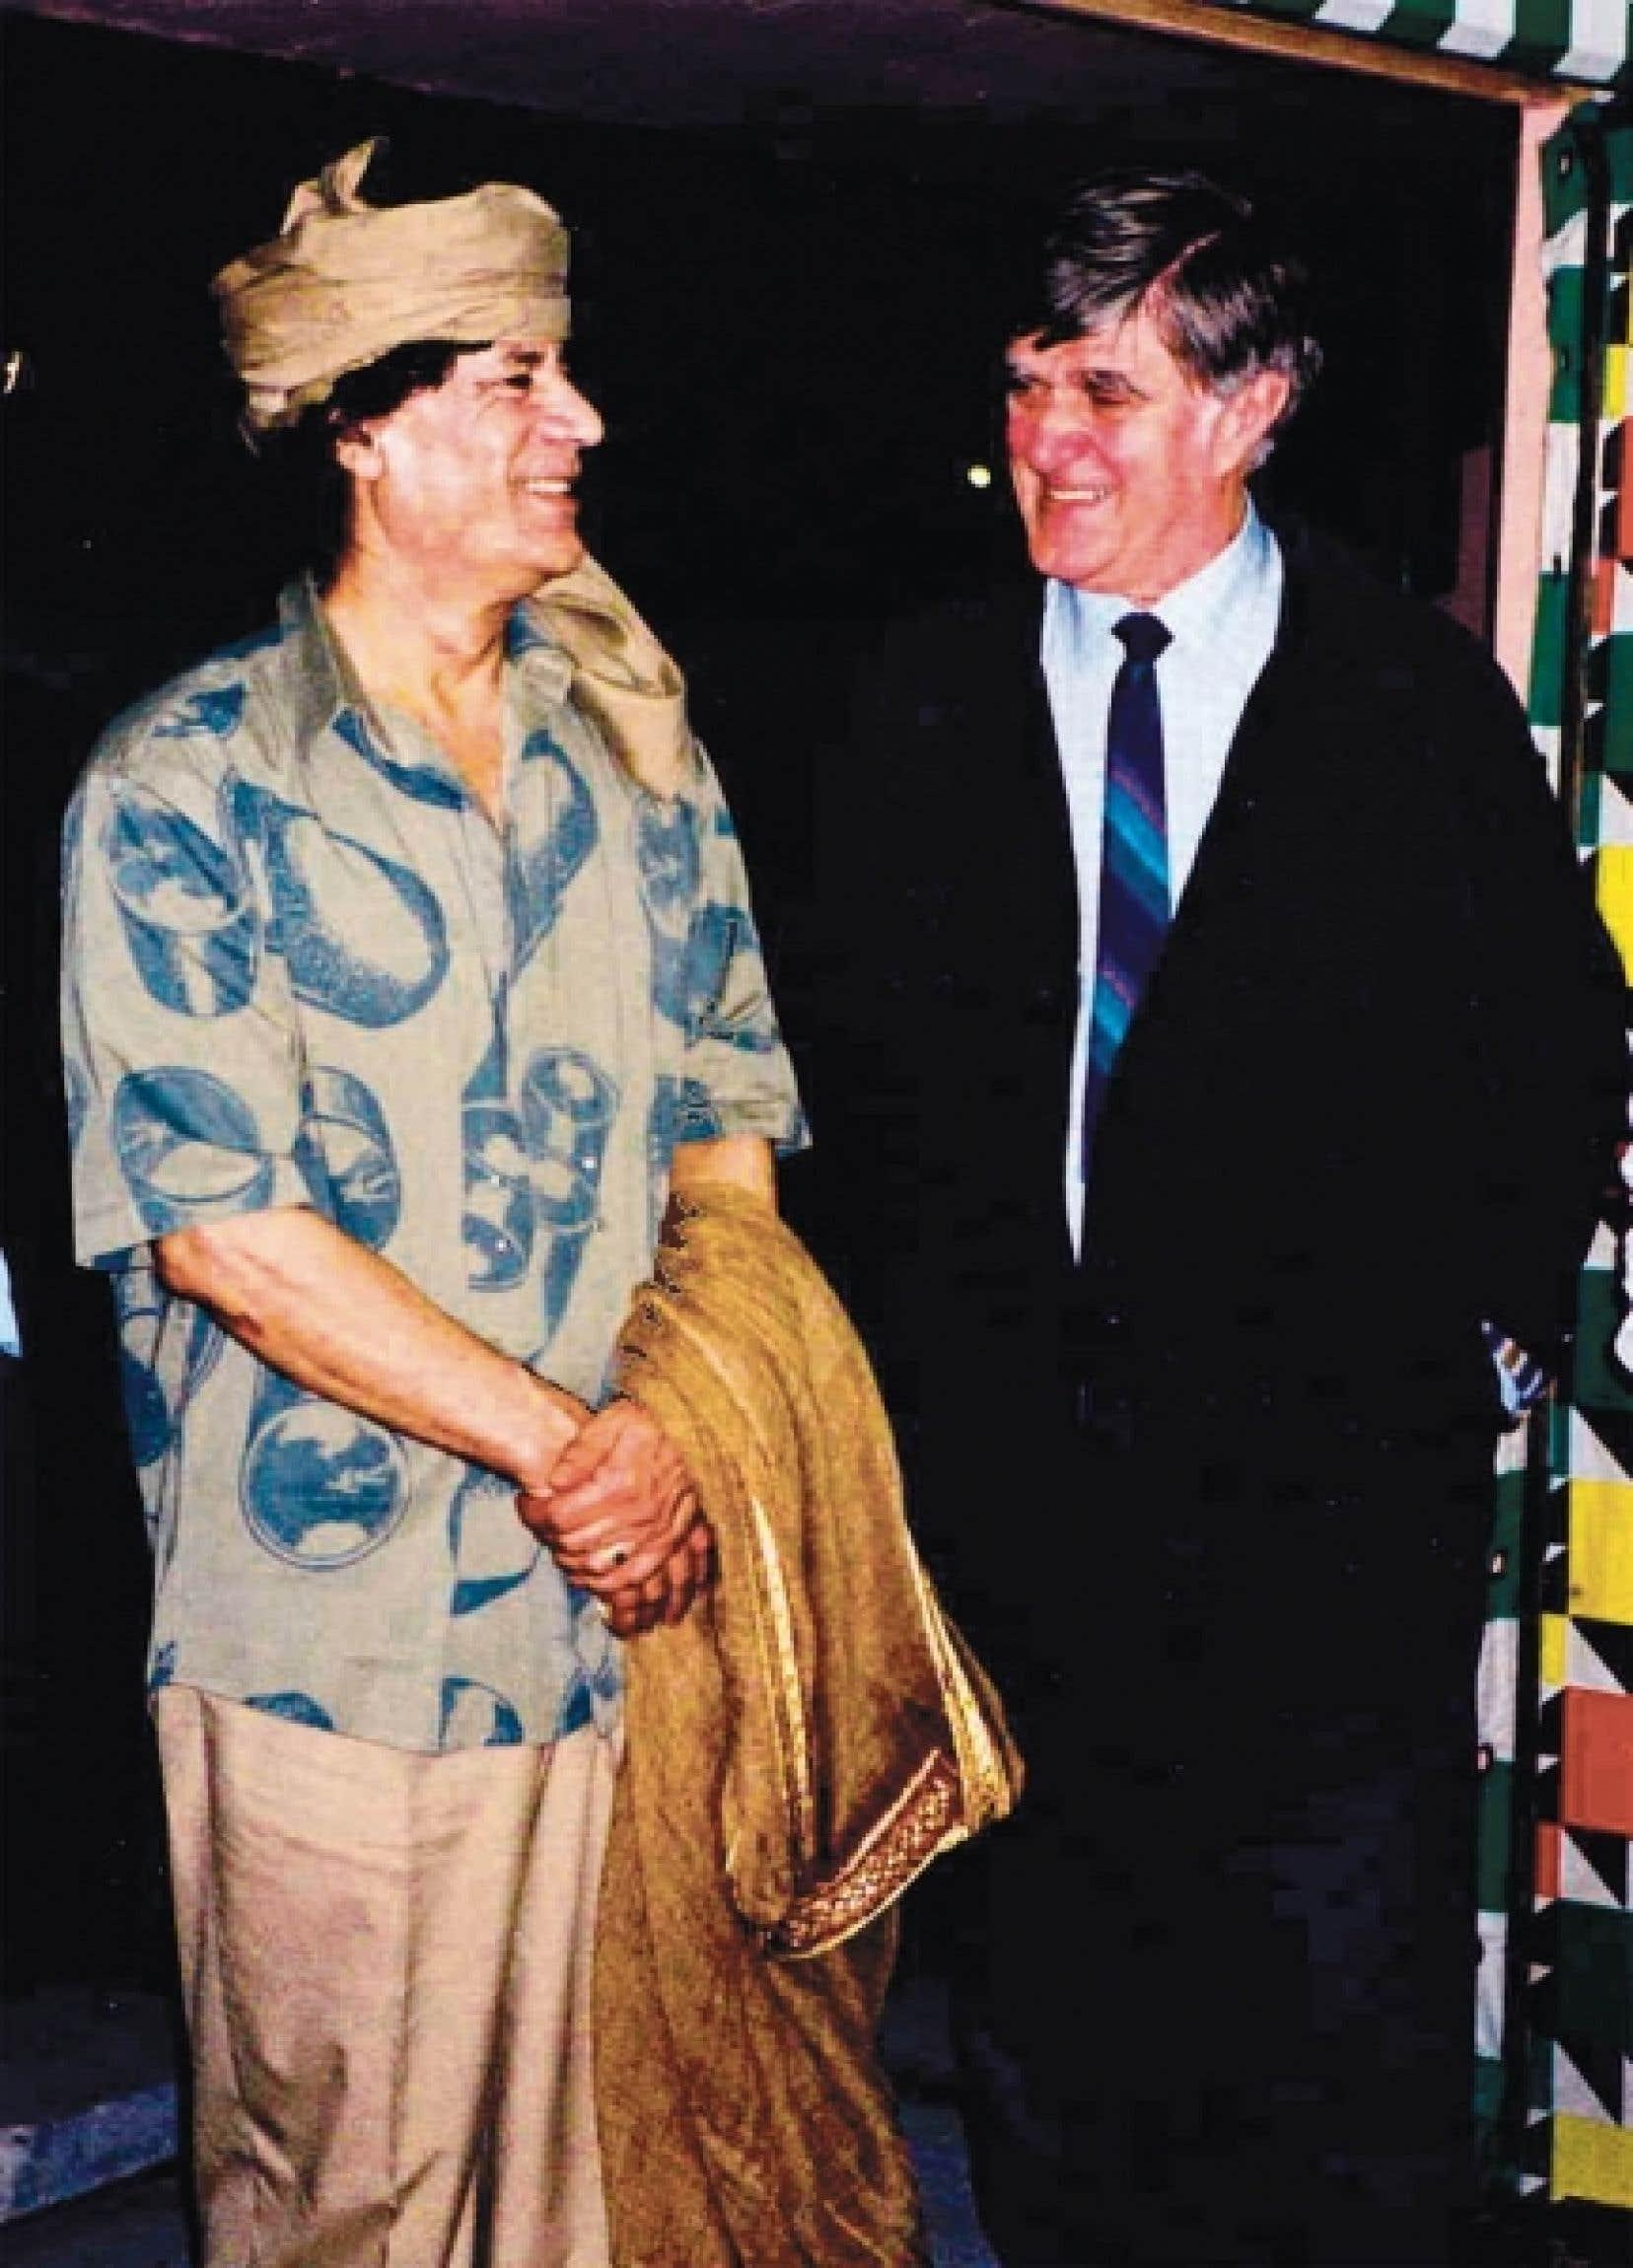 Mouammar Kadhafi, à gauche, en compagnie d'Alain Stanké<br />